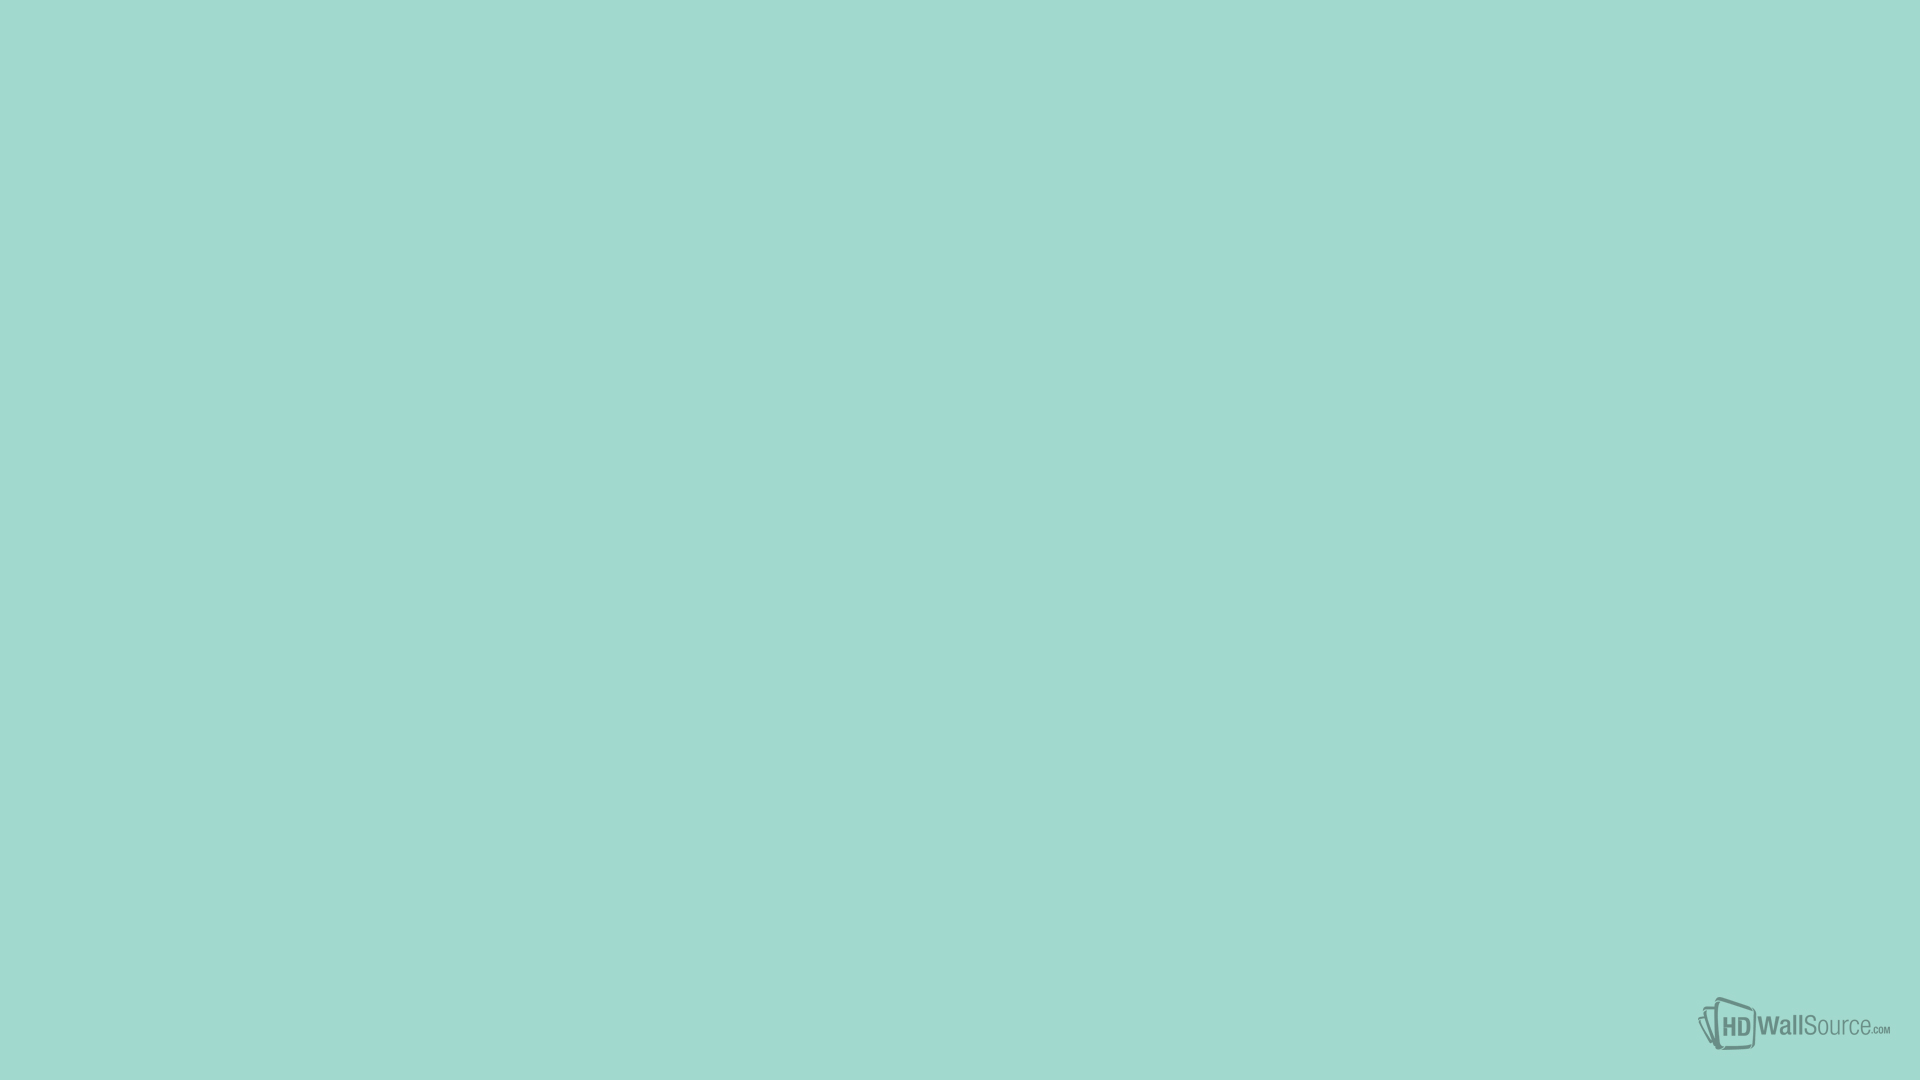 a2d9ce wallpaper 70818